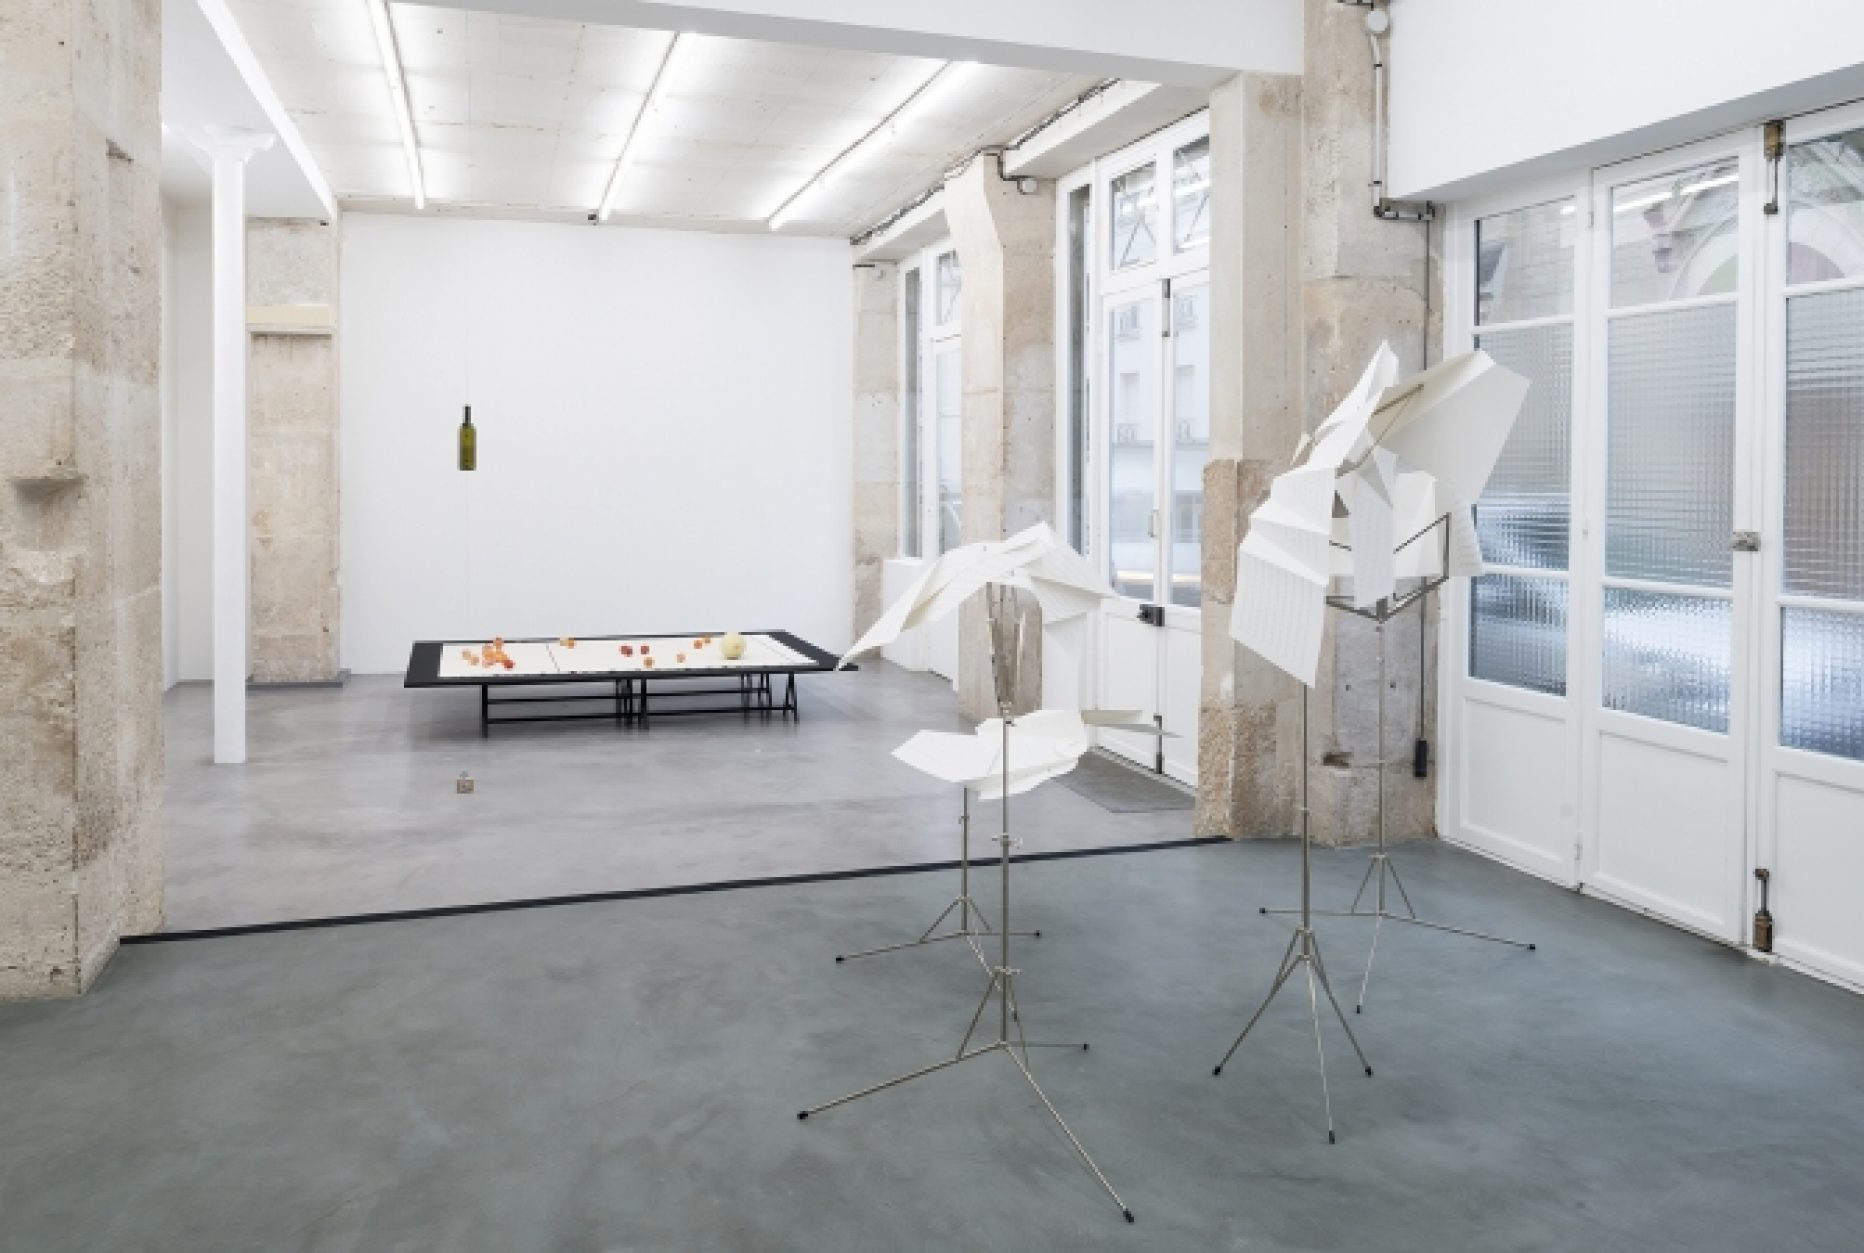 Galerie Jocelyne Wolff